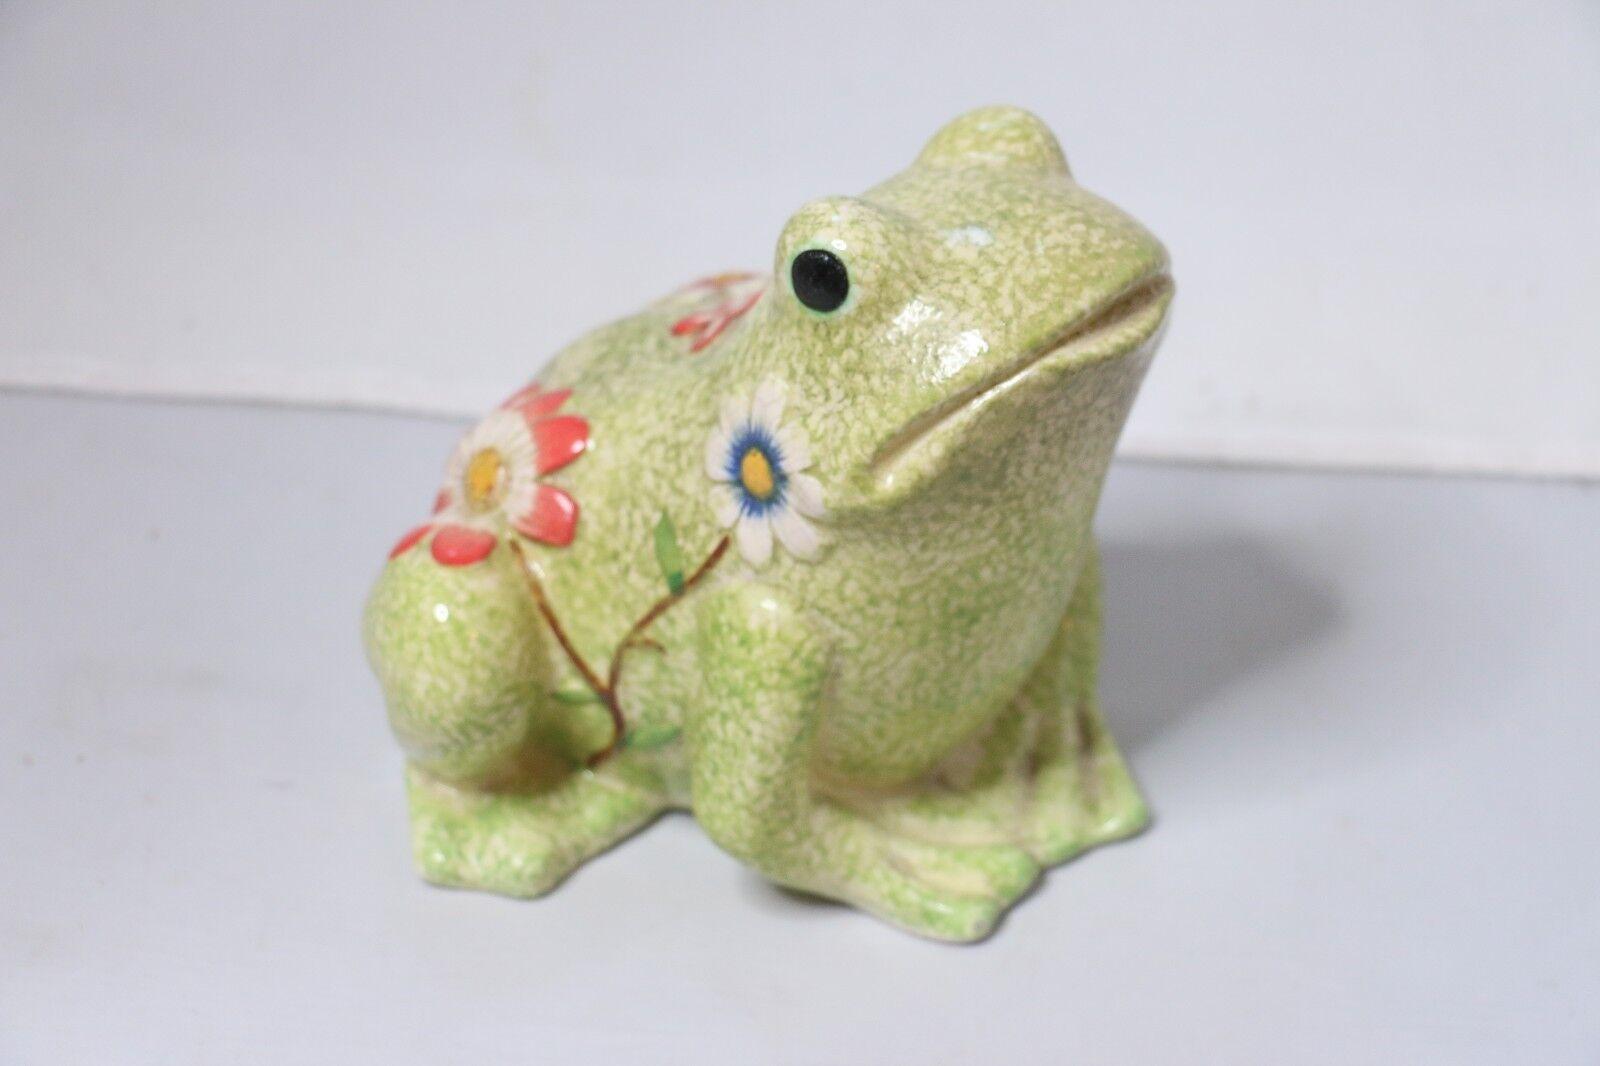 Collections Glass Flower Garden Frog Green